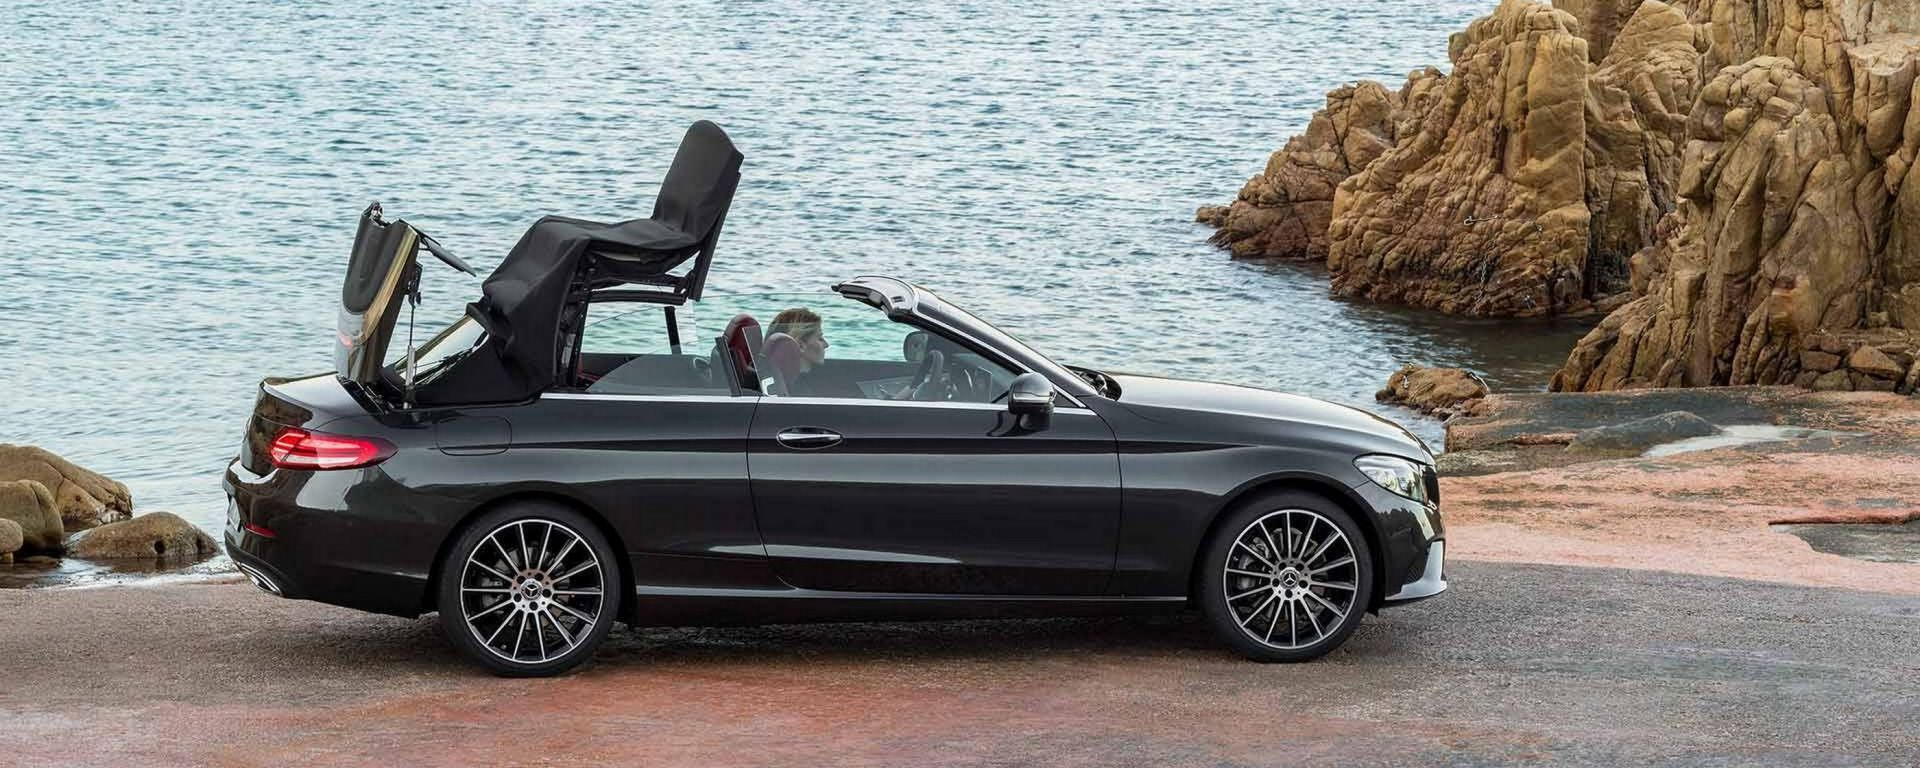 Mercedes Classe C Coupé e Cabrio: restyling per New York